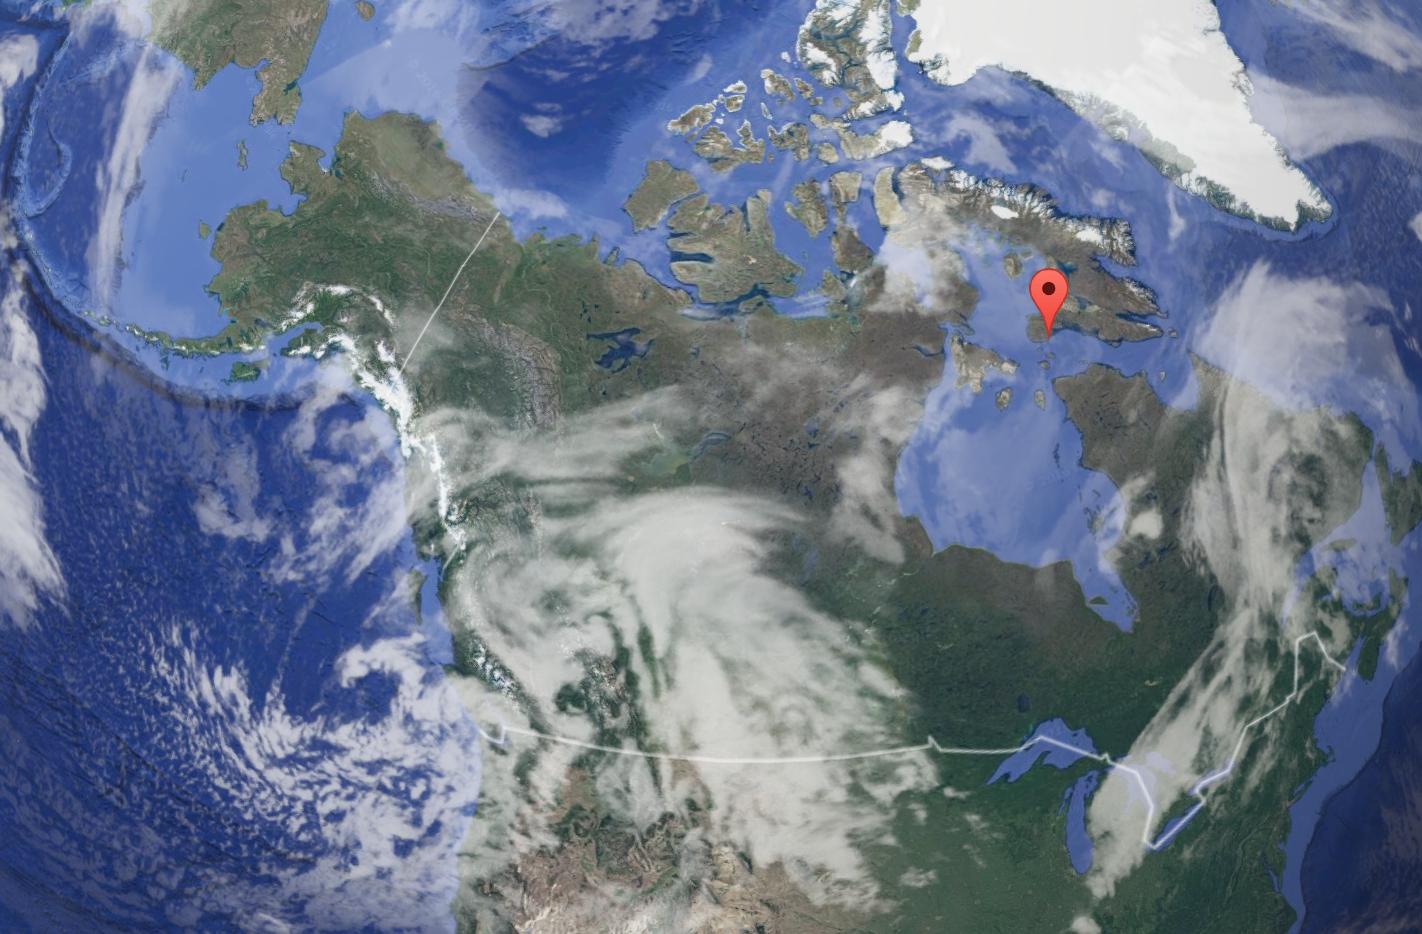 Cape Dorset, Nunavut, Canada. Image Courtesy of Google Maps